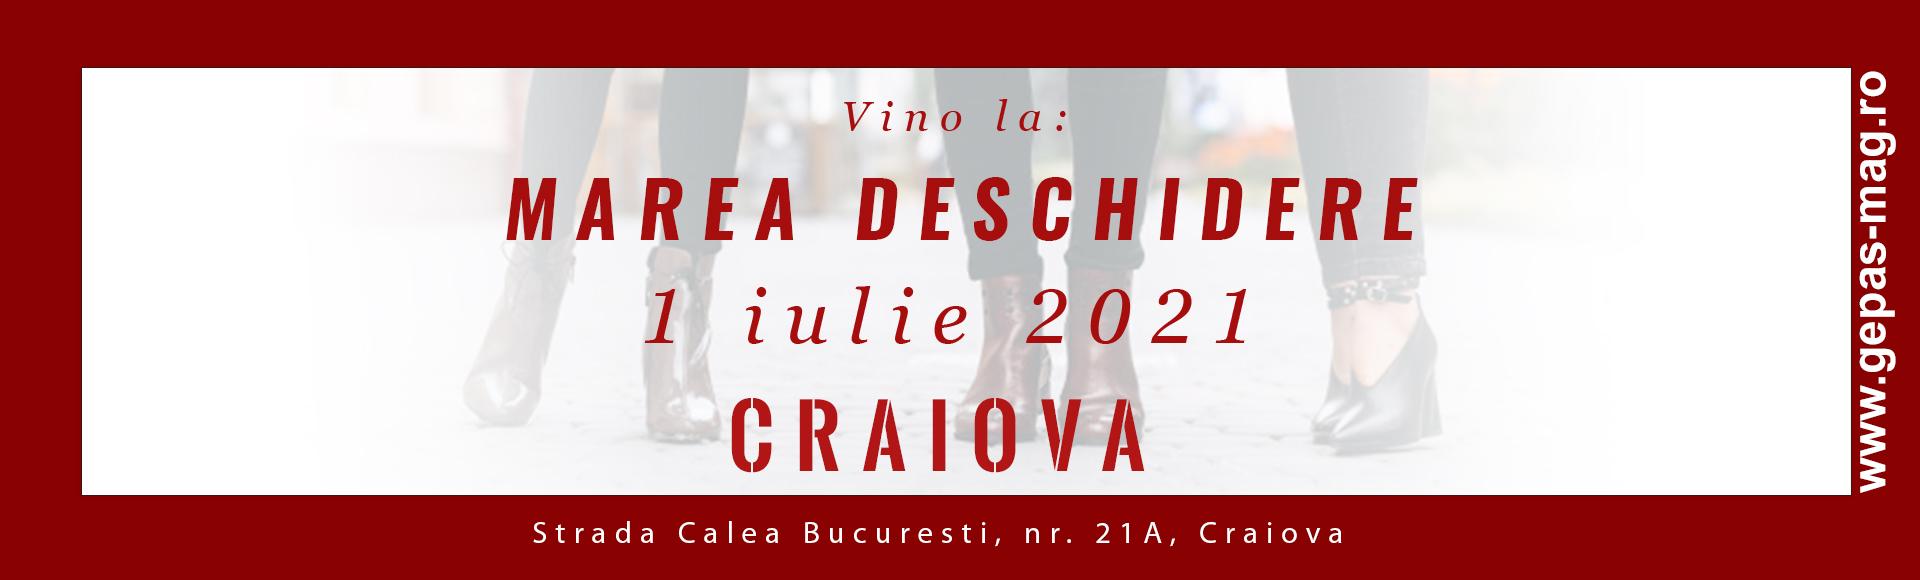 Deschidere magazin Craiova